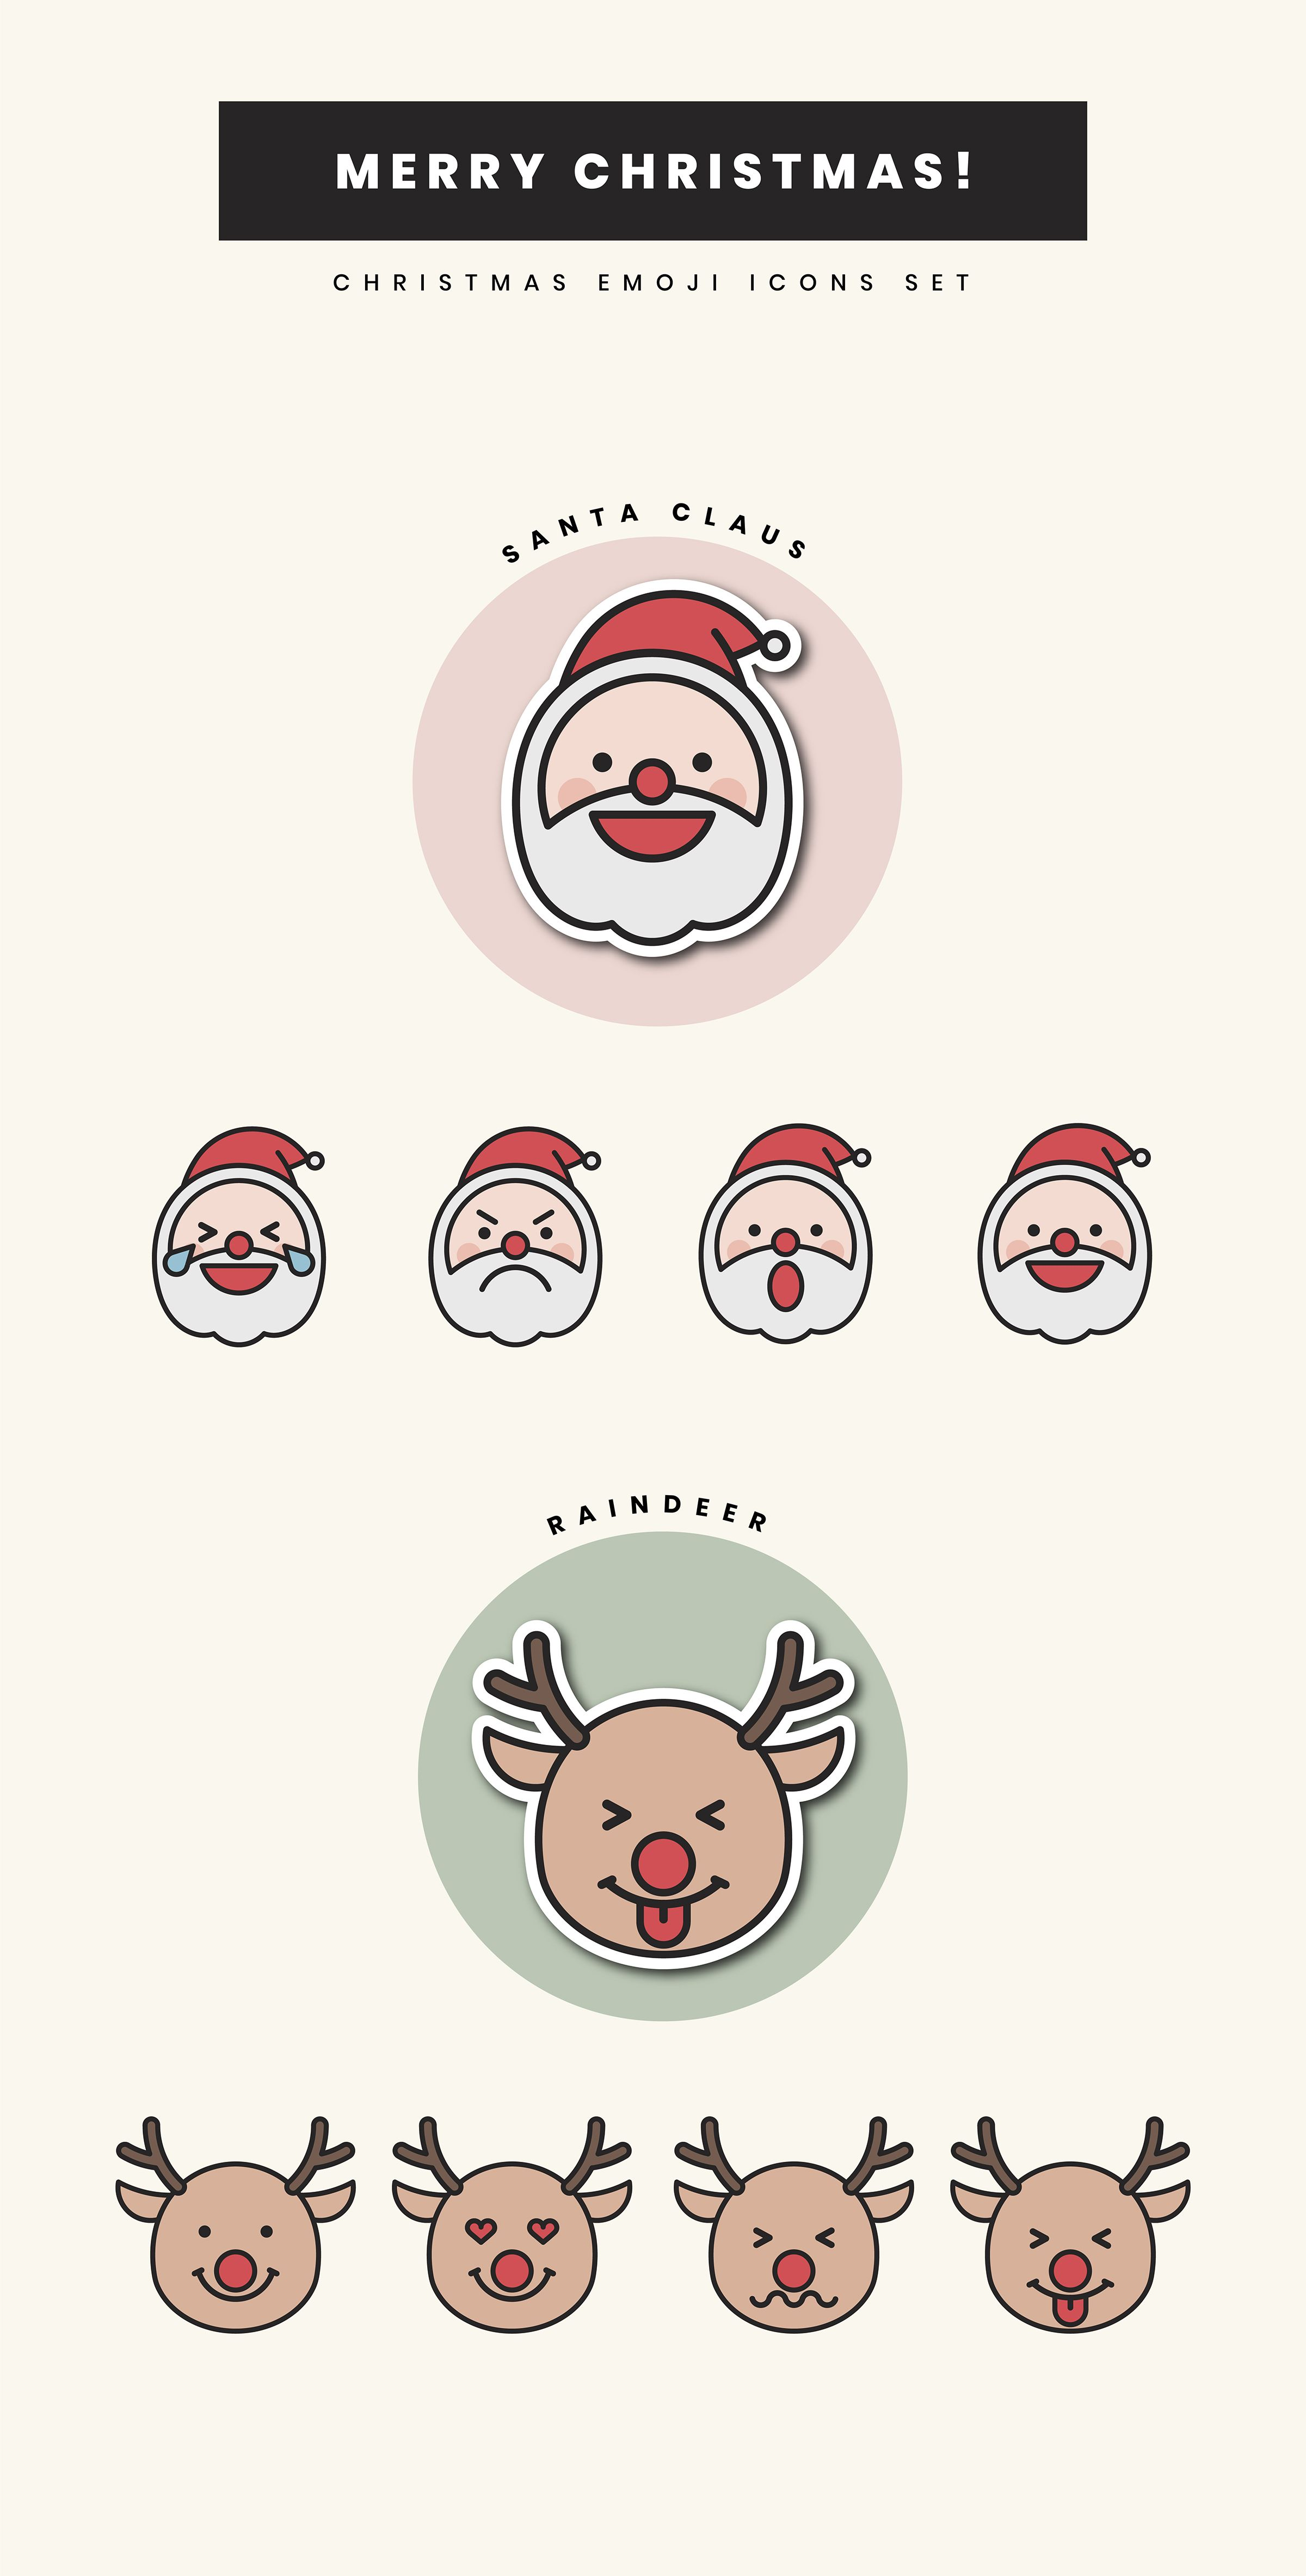 Download these royaltyfree Christmas emoji icon